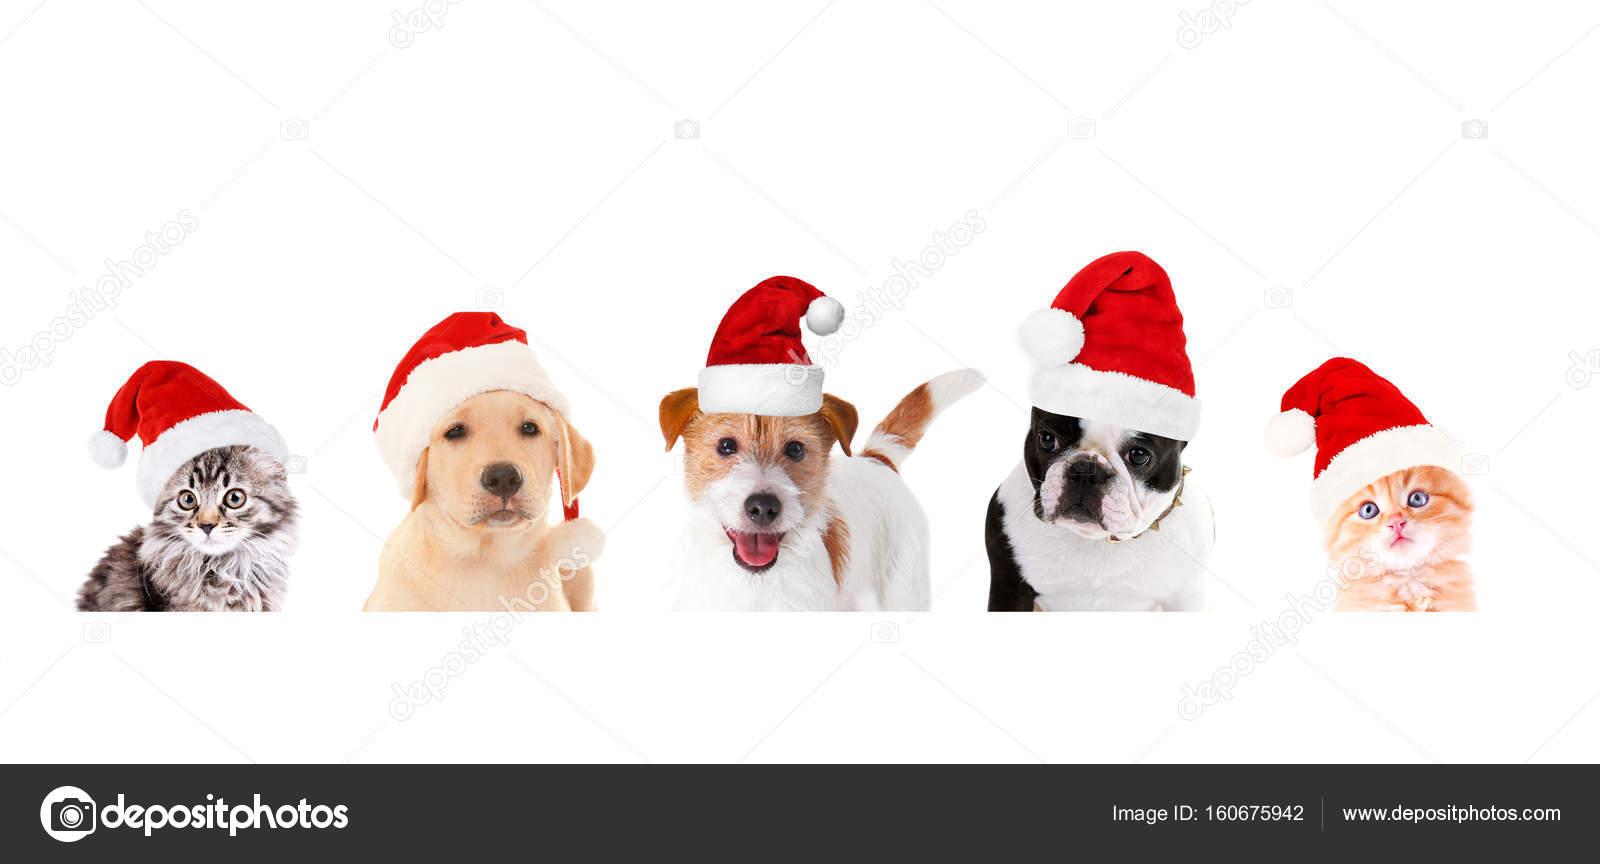 a6c61cbc354da Funny pets in Santa hats — Stock Photo © belchonock  160675942